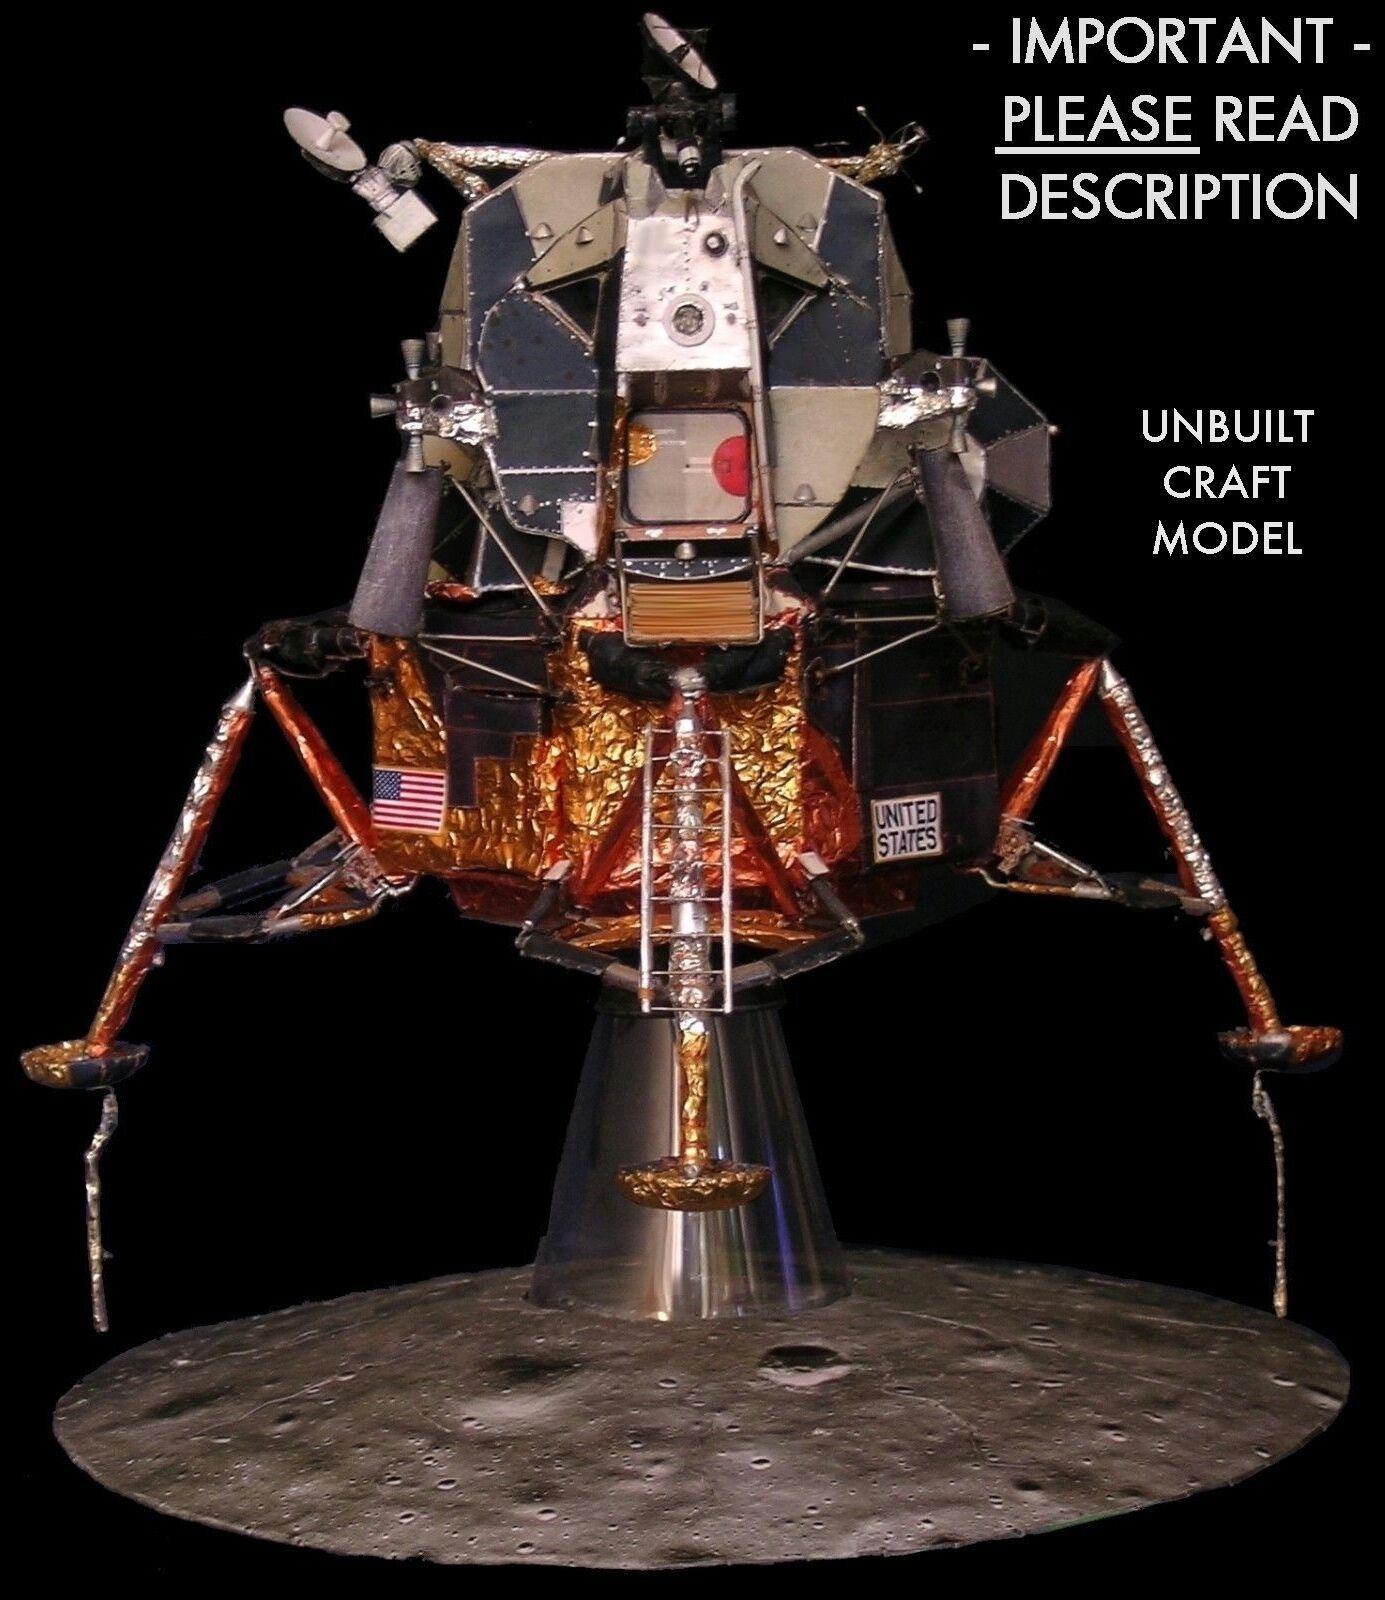 Apollo 11 Lunar Module LM-5 1:32 Craft Model FOR Revell Command Service CSM READ